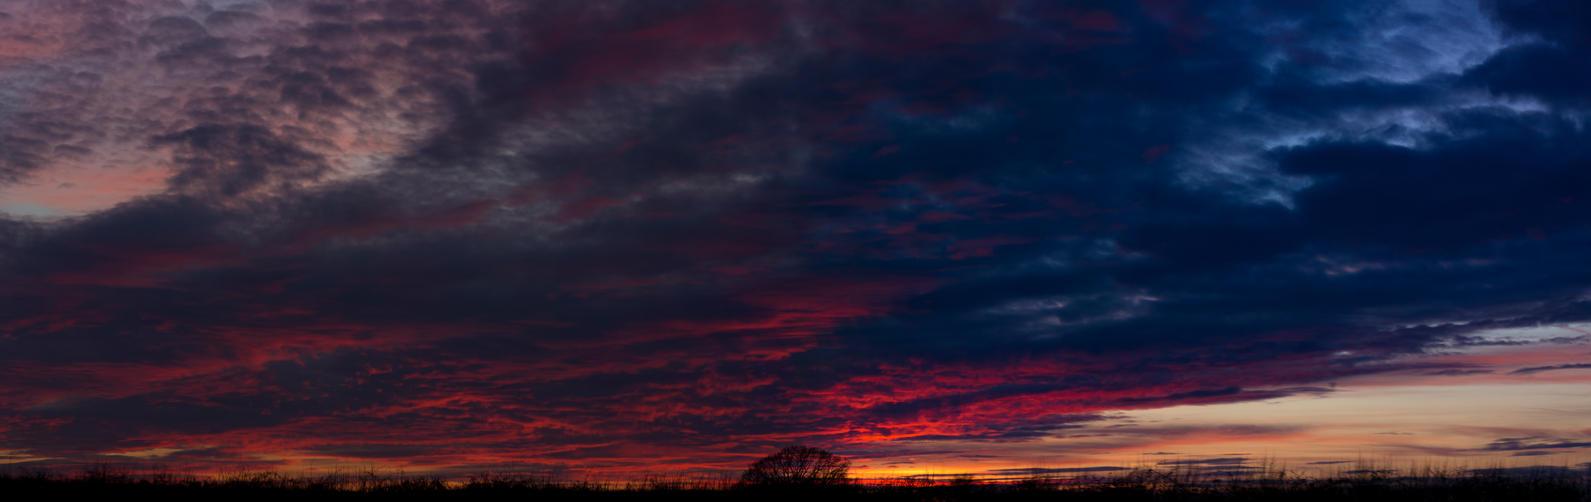 Stevington Sunset! by Mincingyoda